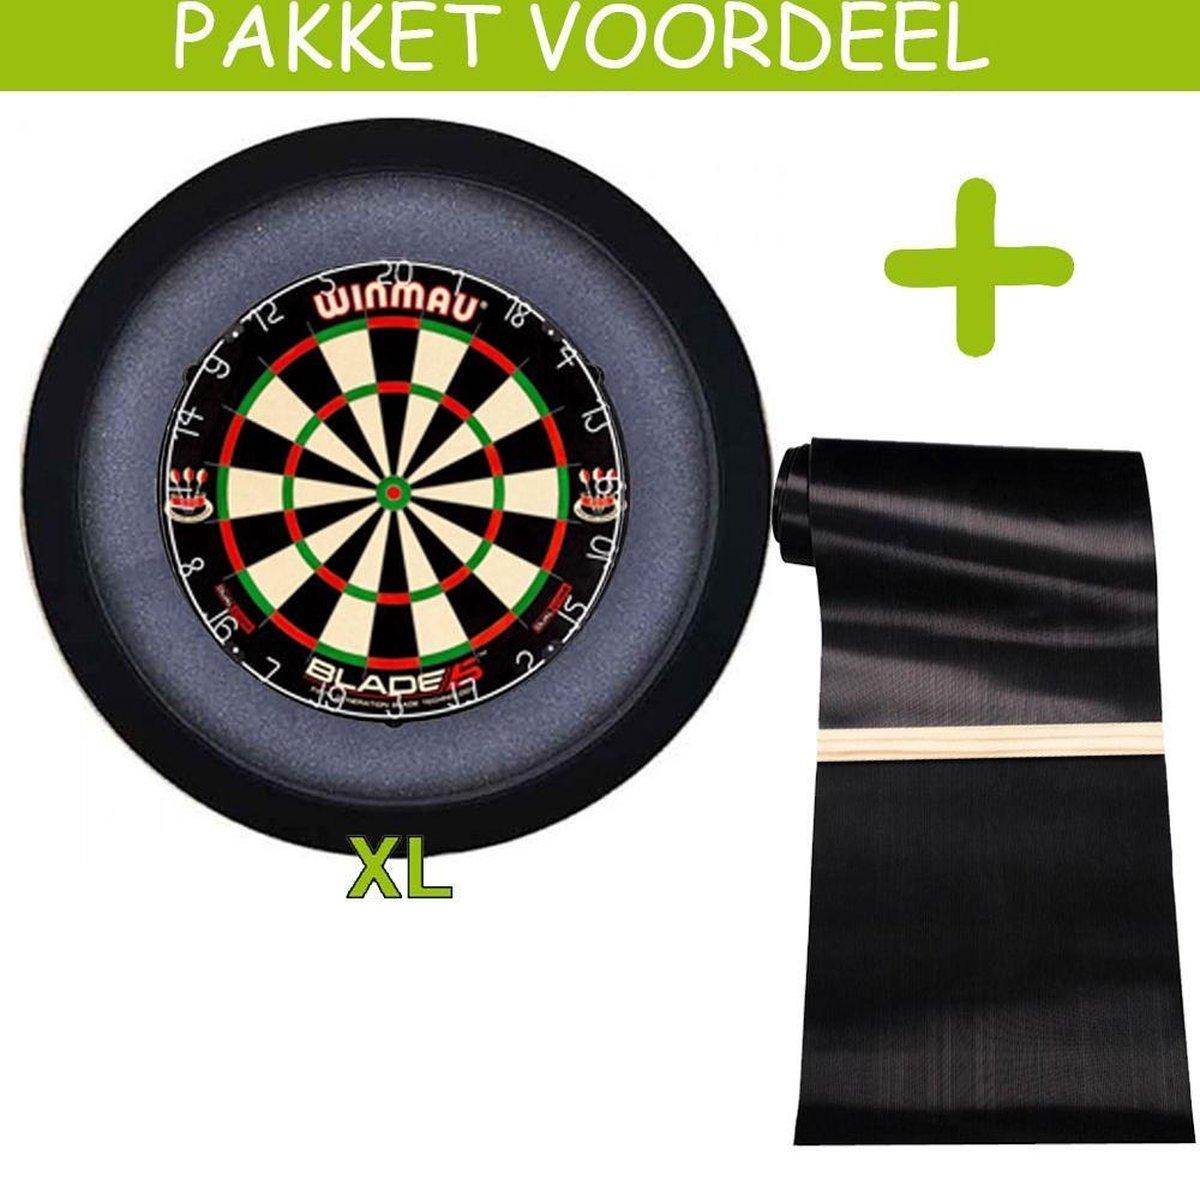 Dartbaan Pro - Dual Core - 120 x 300 Inclusief Oche - Dartbordverlichting Basic XL - (Zwart)